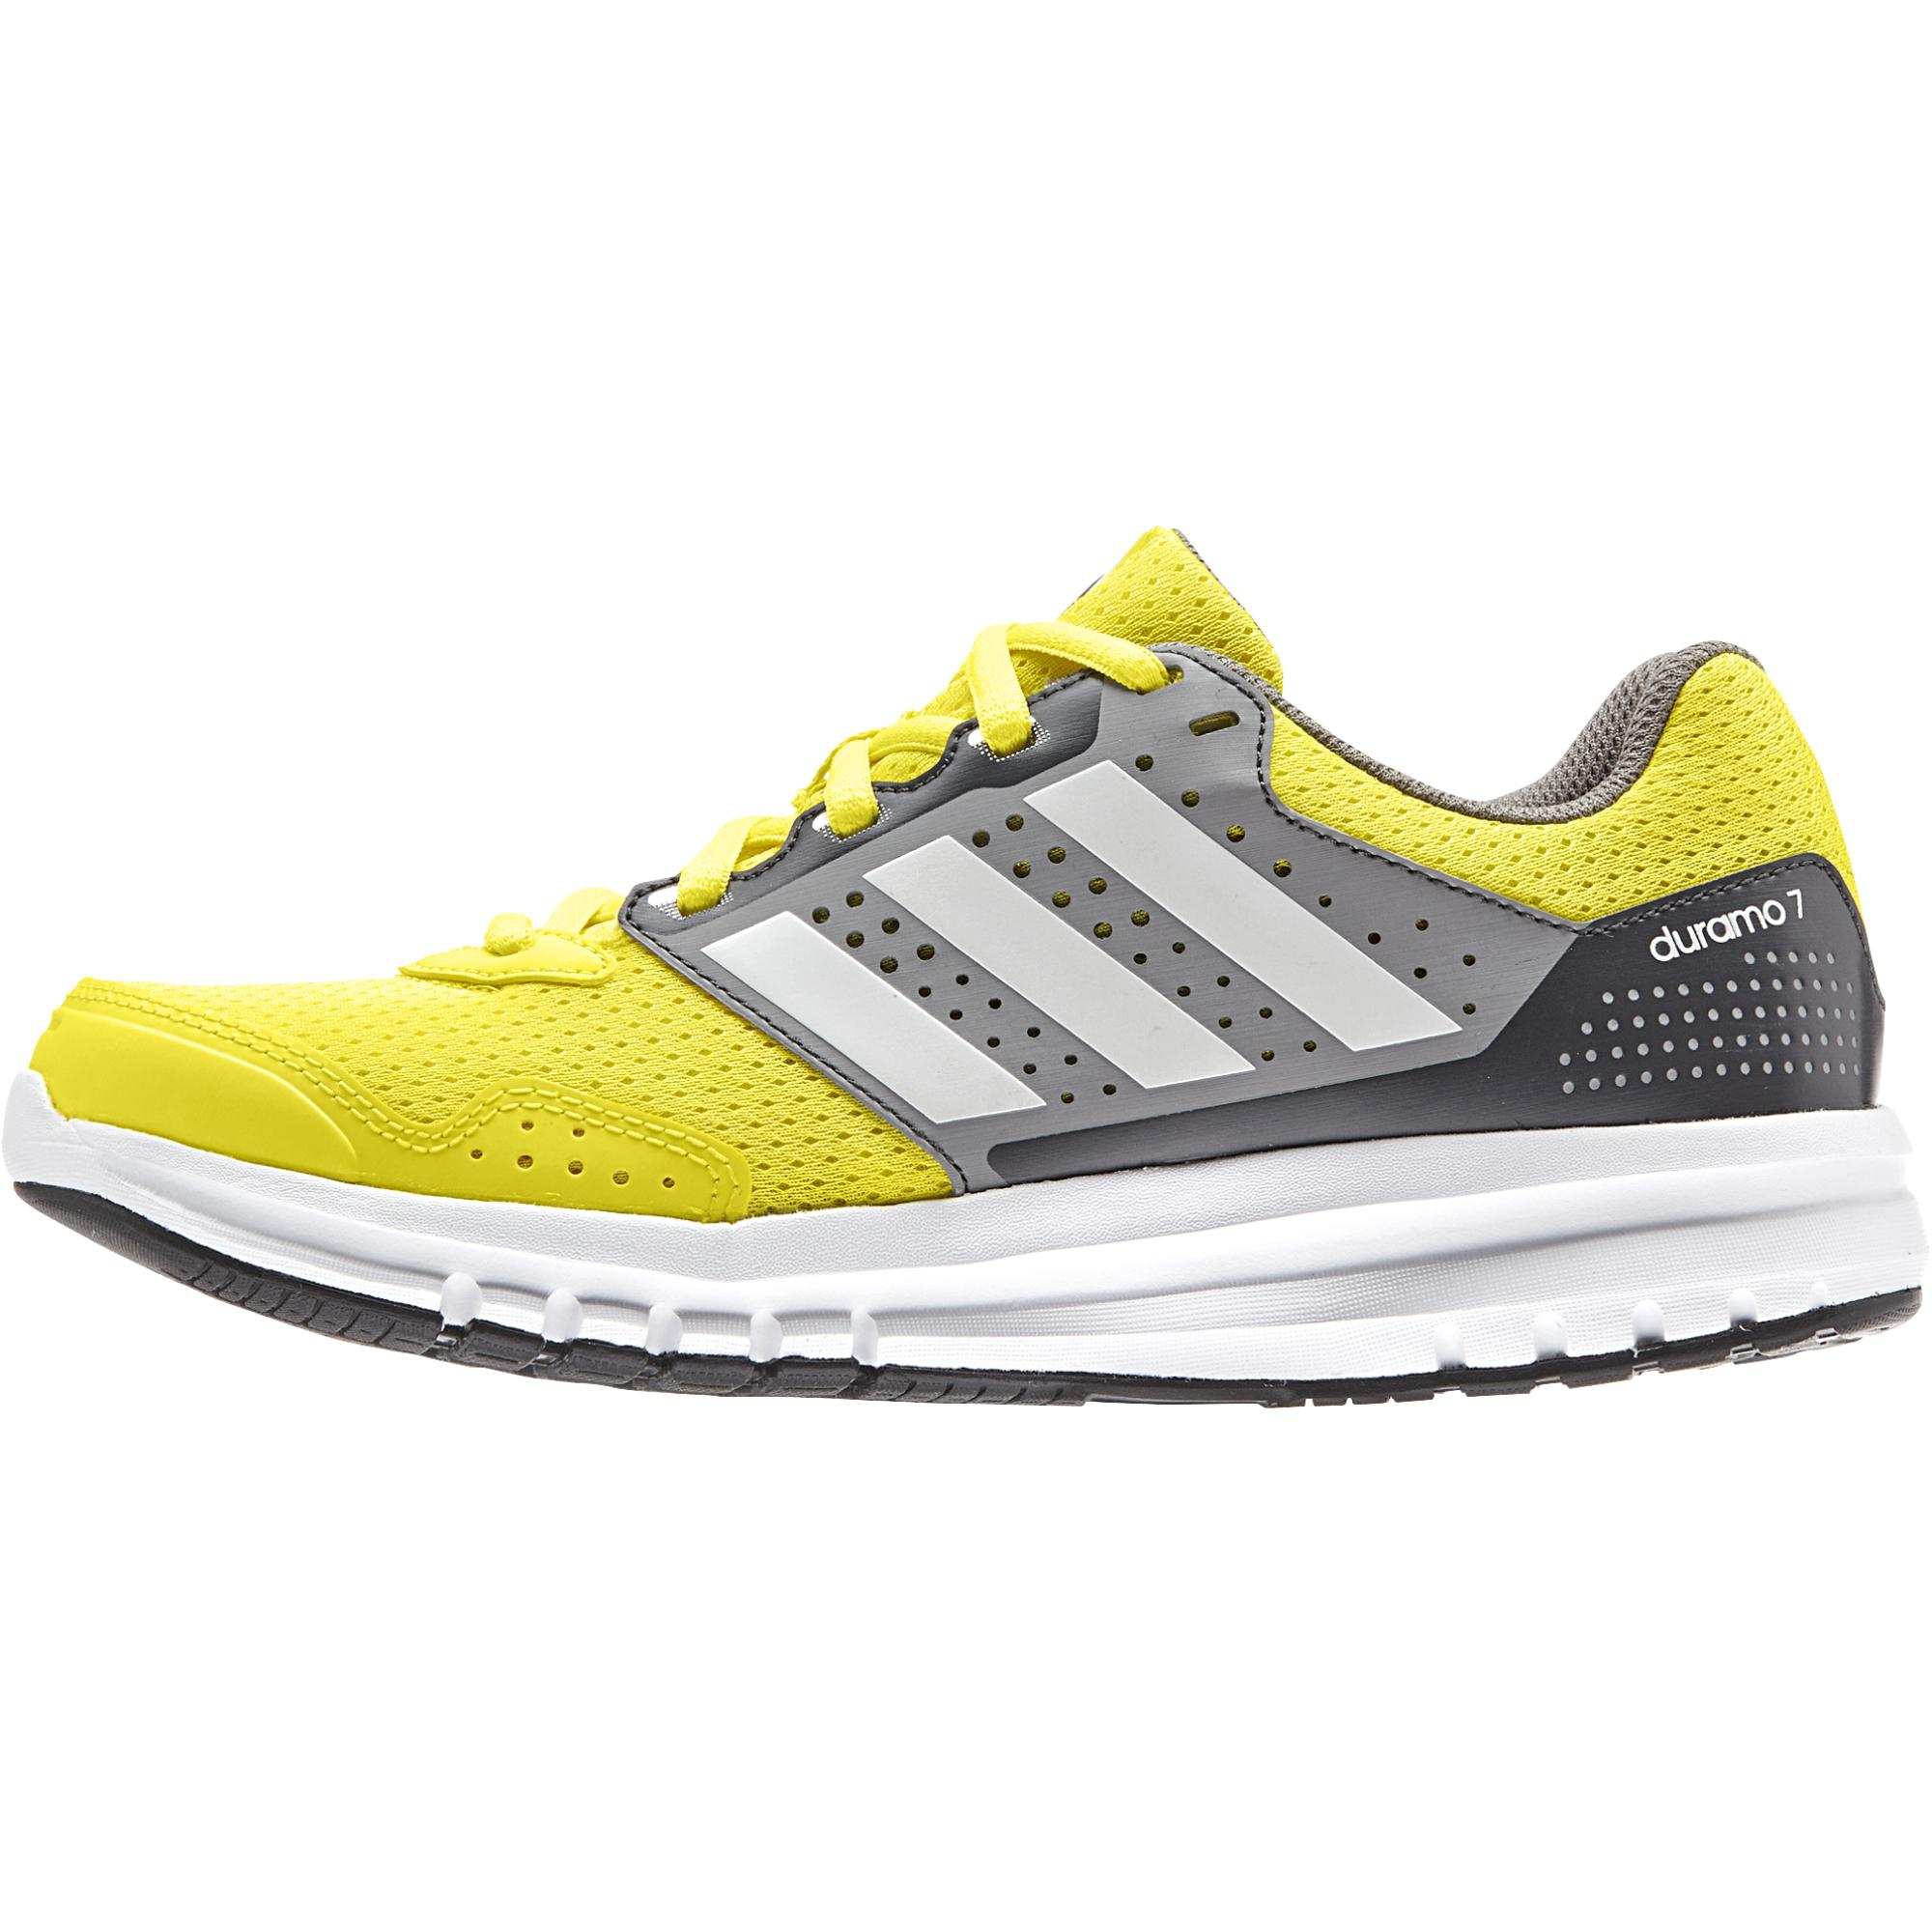 newest 0c344 5d066 Adidas Duramo 7 K (amarilloblancogris)